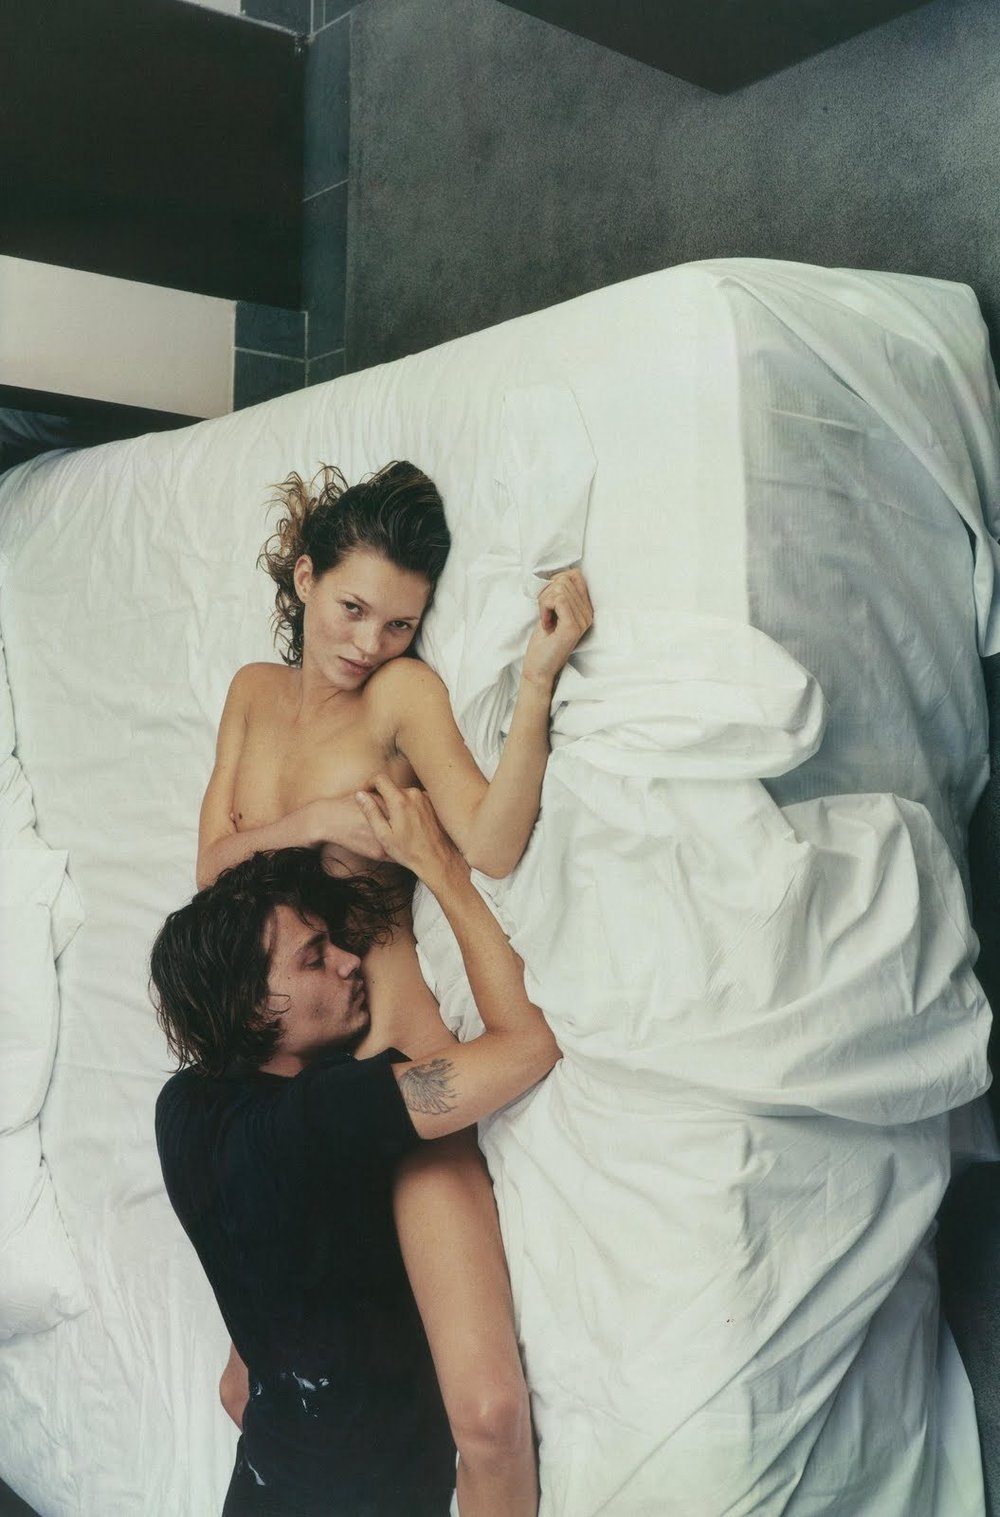 Johnny Depp & Kate Moss by Annie Leibovitz - 1994